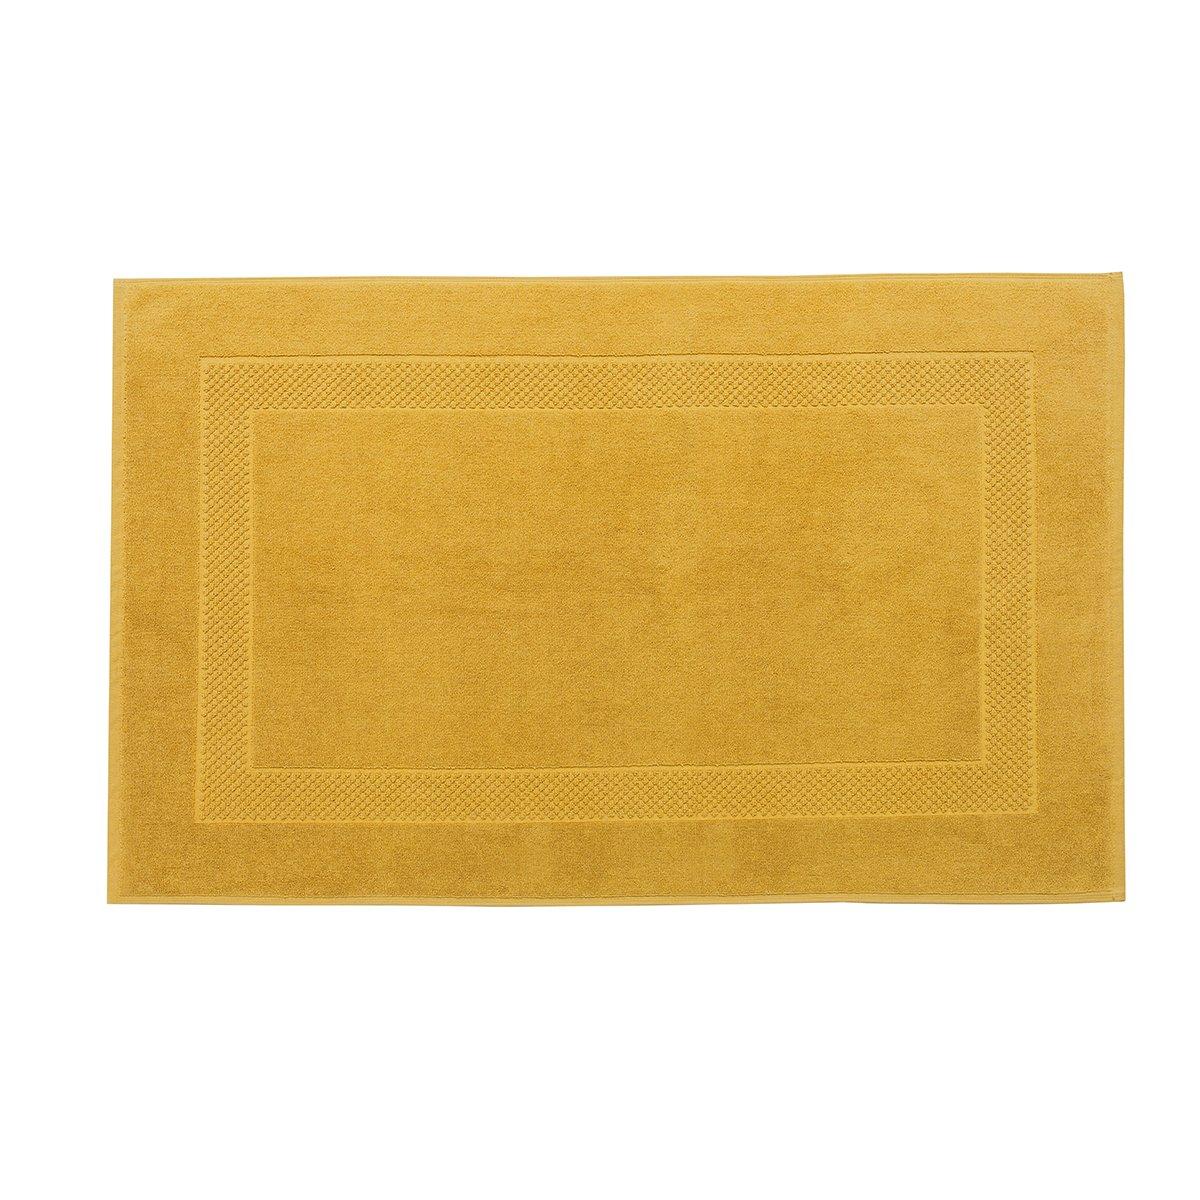 Tapis de bain coton 60x80 cm miel